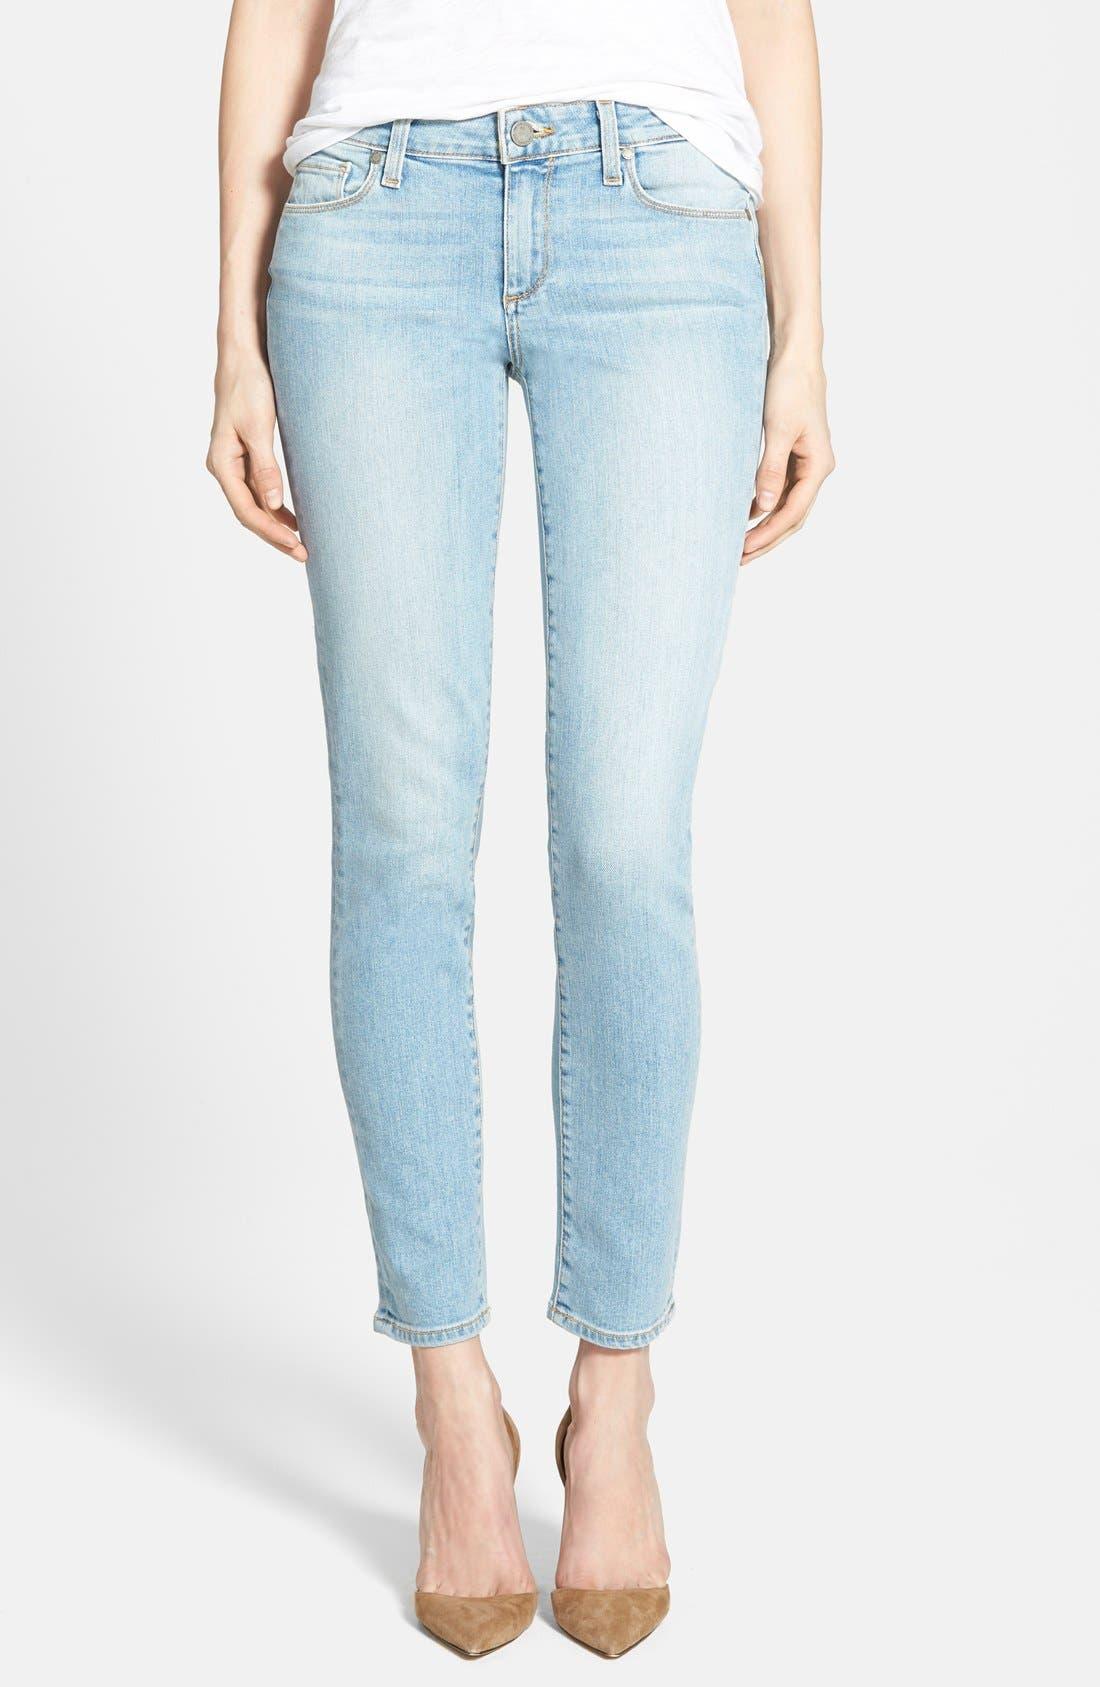 Alternate Image 1 Selected - Paige Denim 'Skyline' Ankle Peg Jeans (Loren Blue)